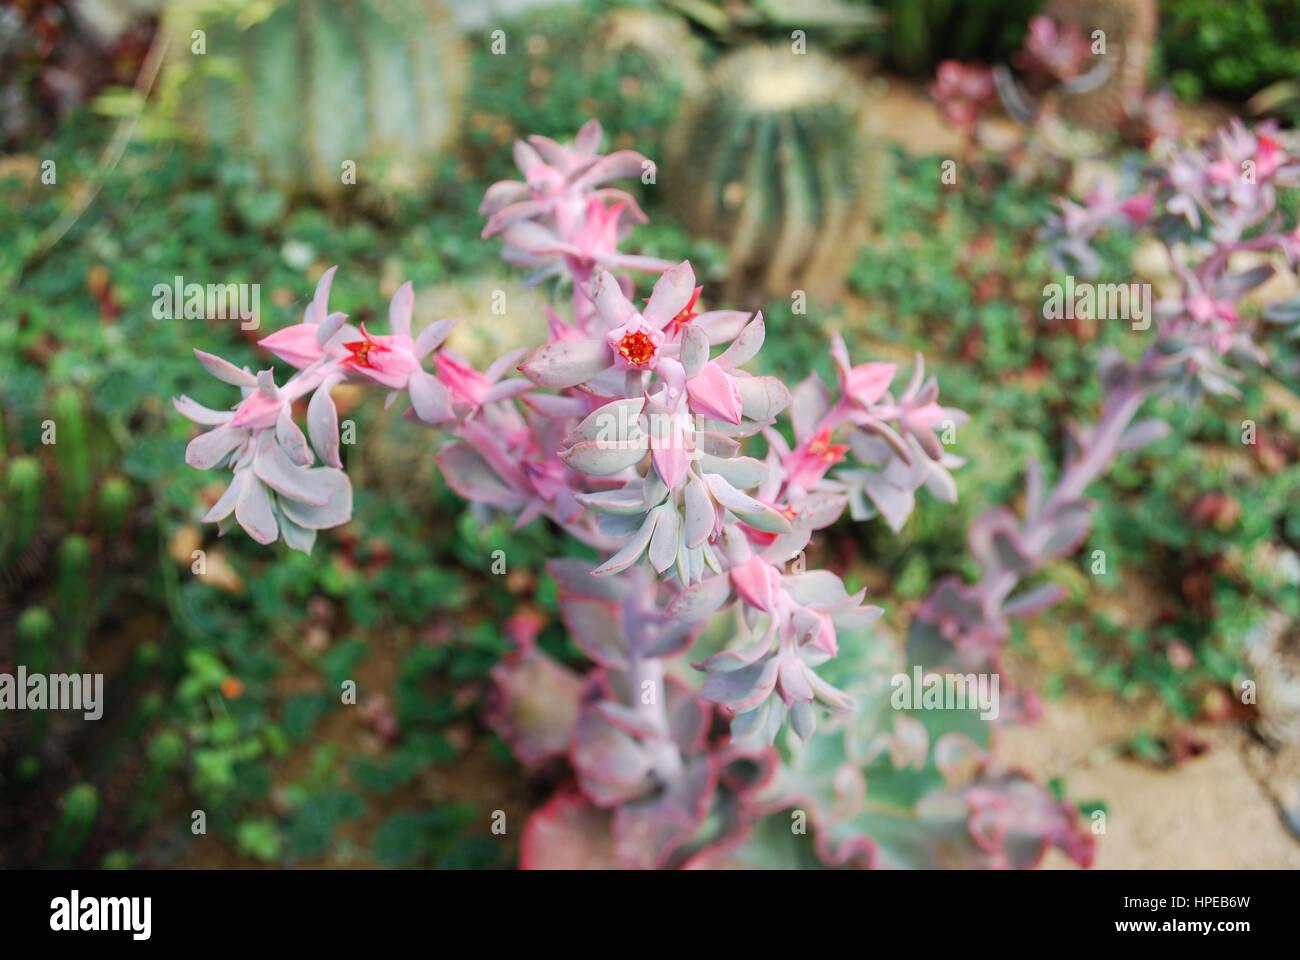 Echeveria 'Takasago No Okina' succulents bloom. Decorative plant. - Stock Image